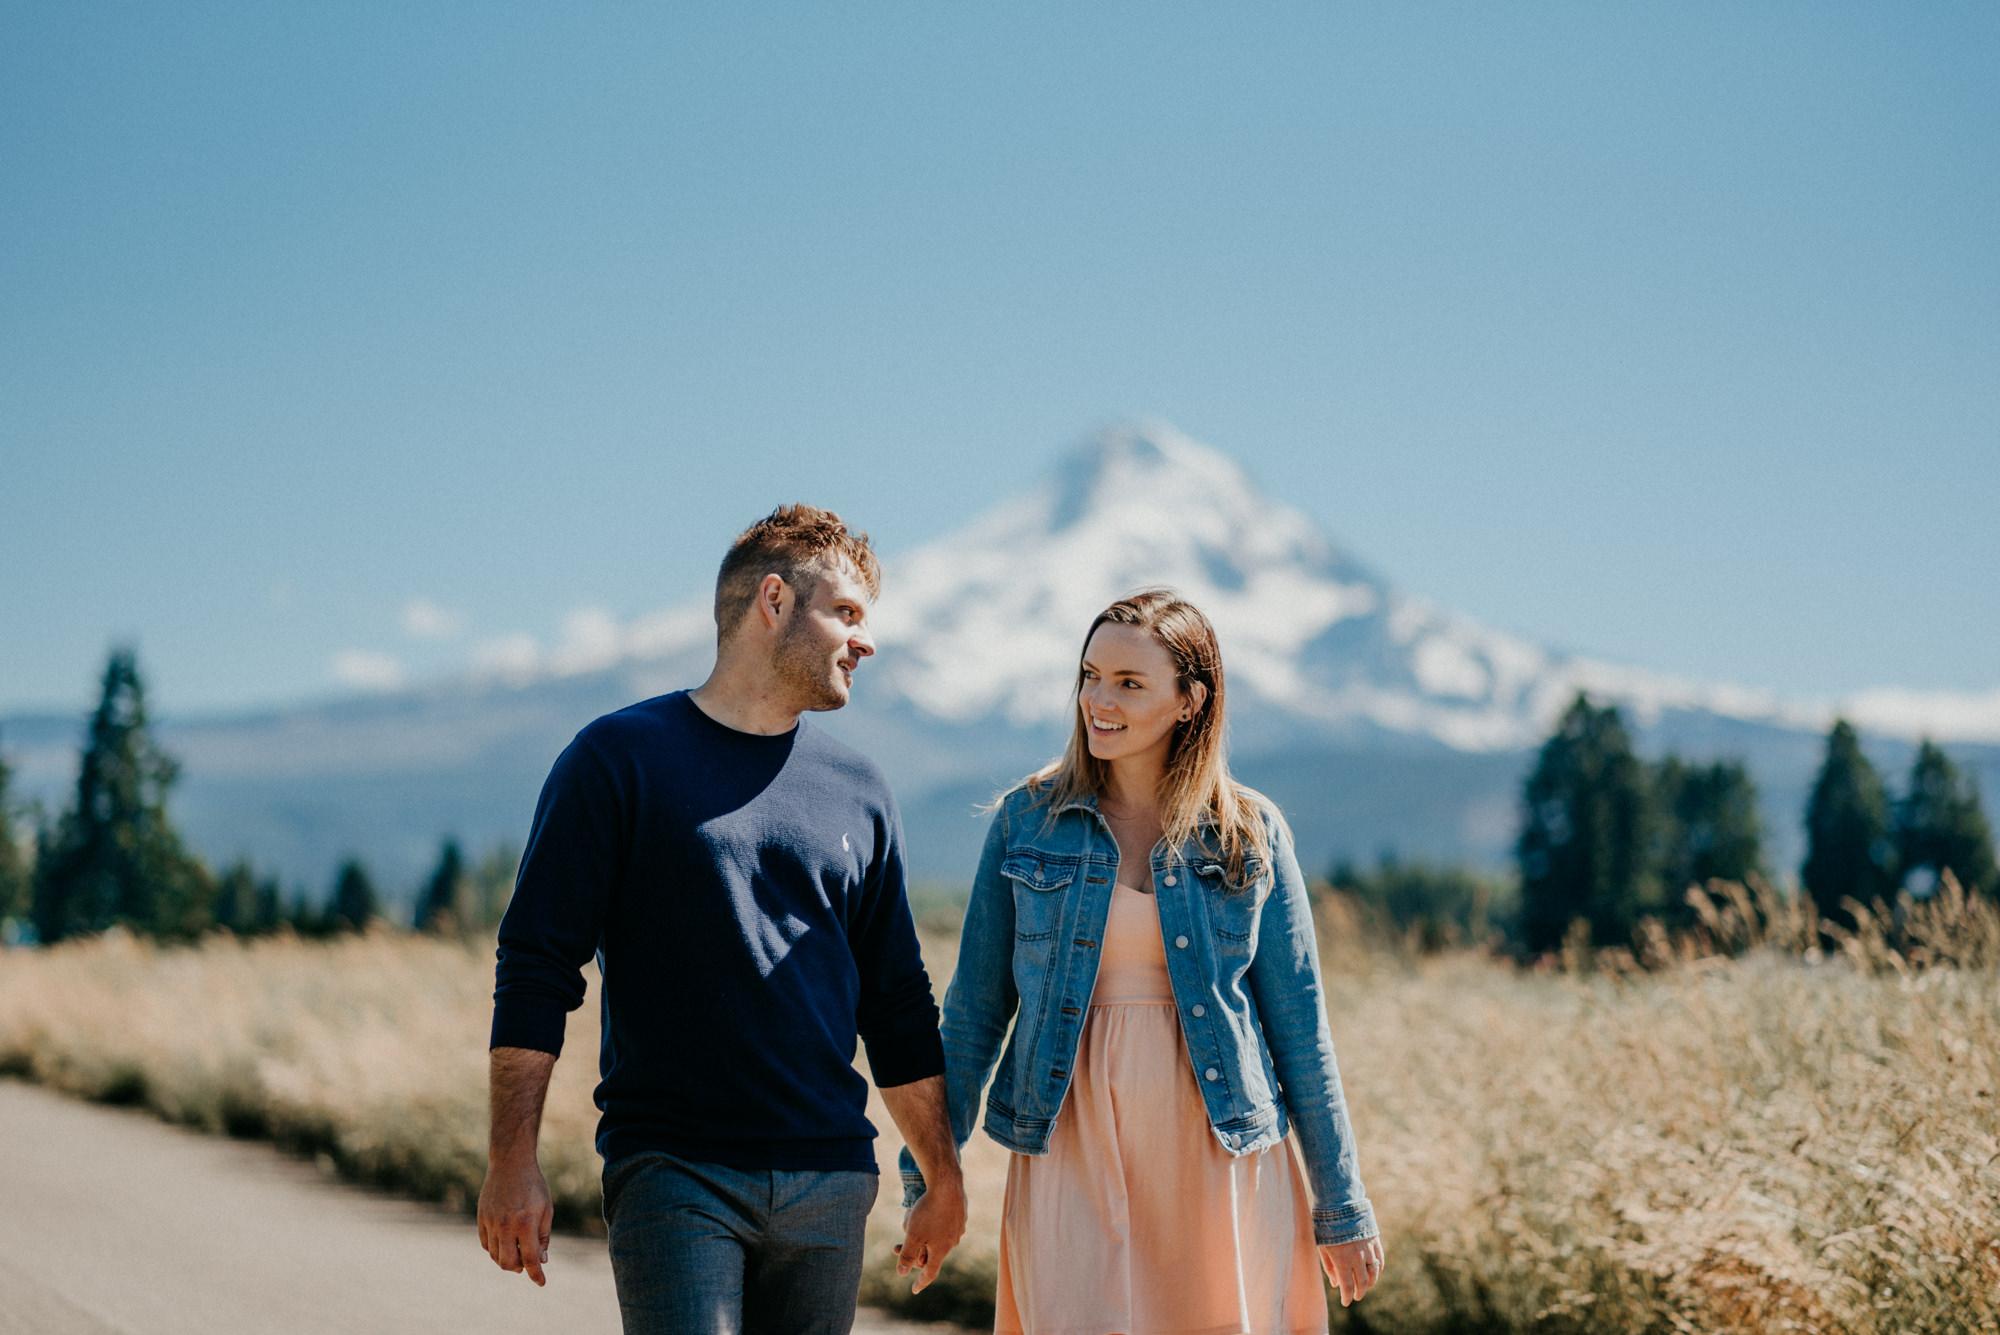 14-Mt-hood-lavender-farms-engagment-couple-summer-7424.jpg